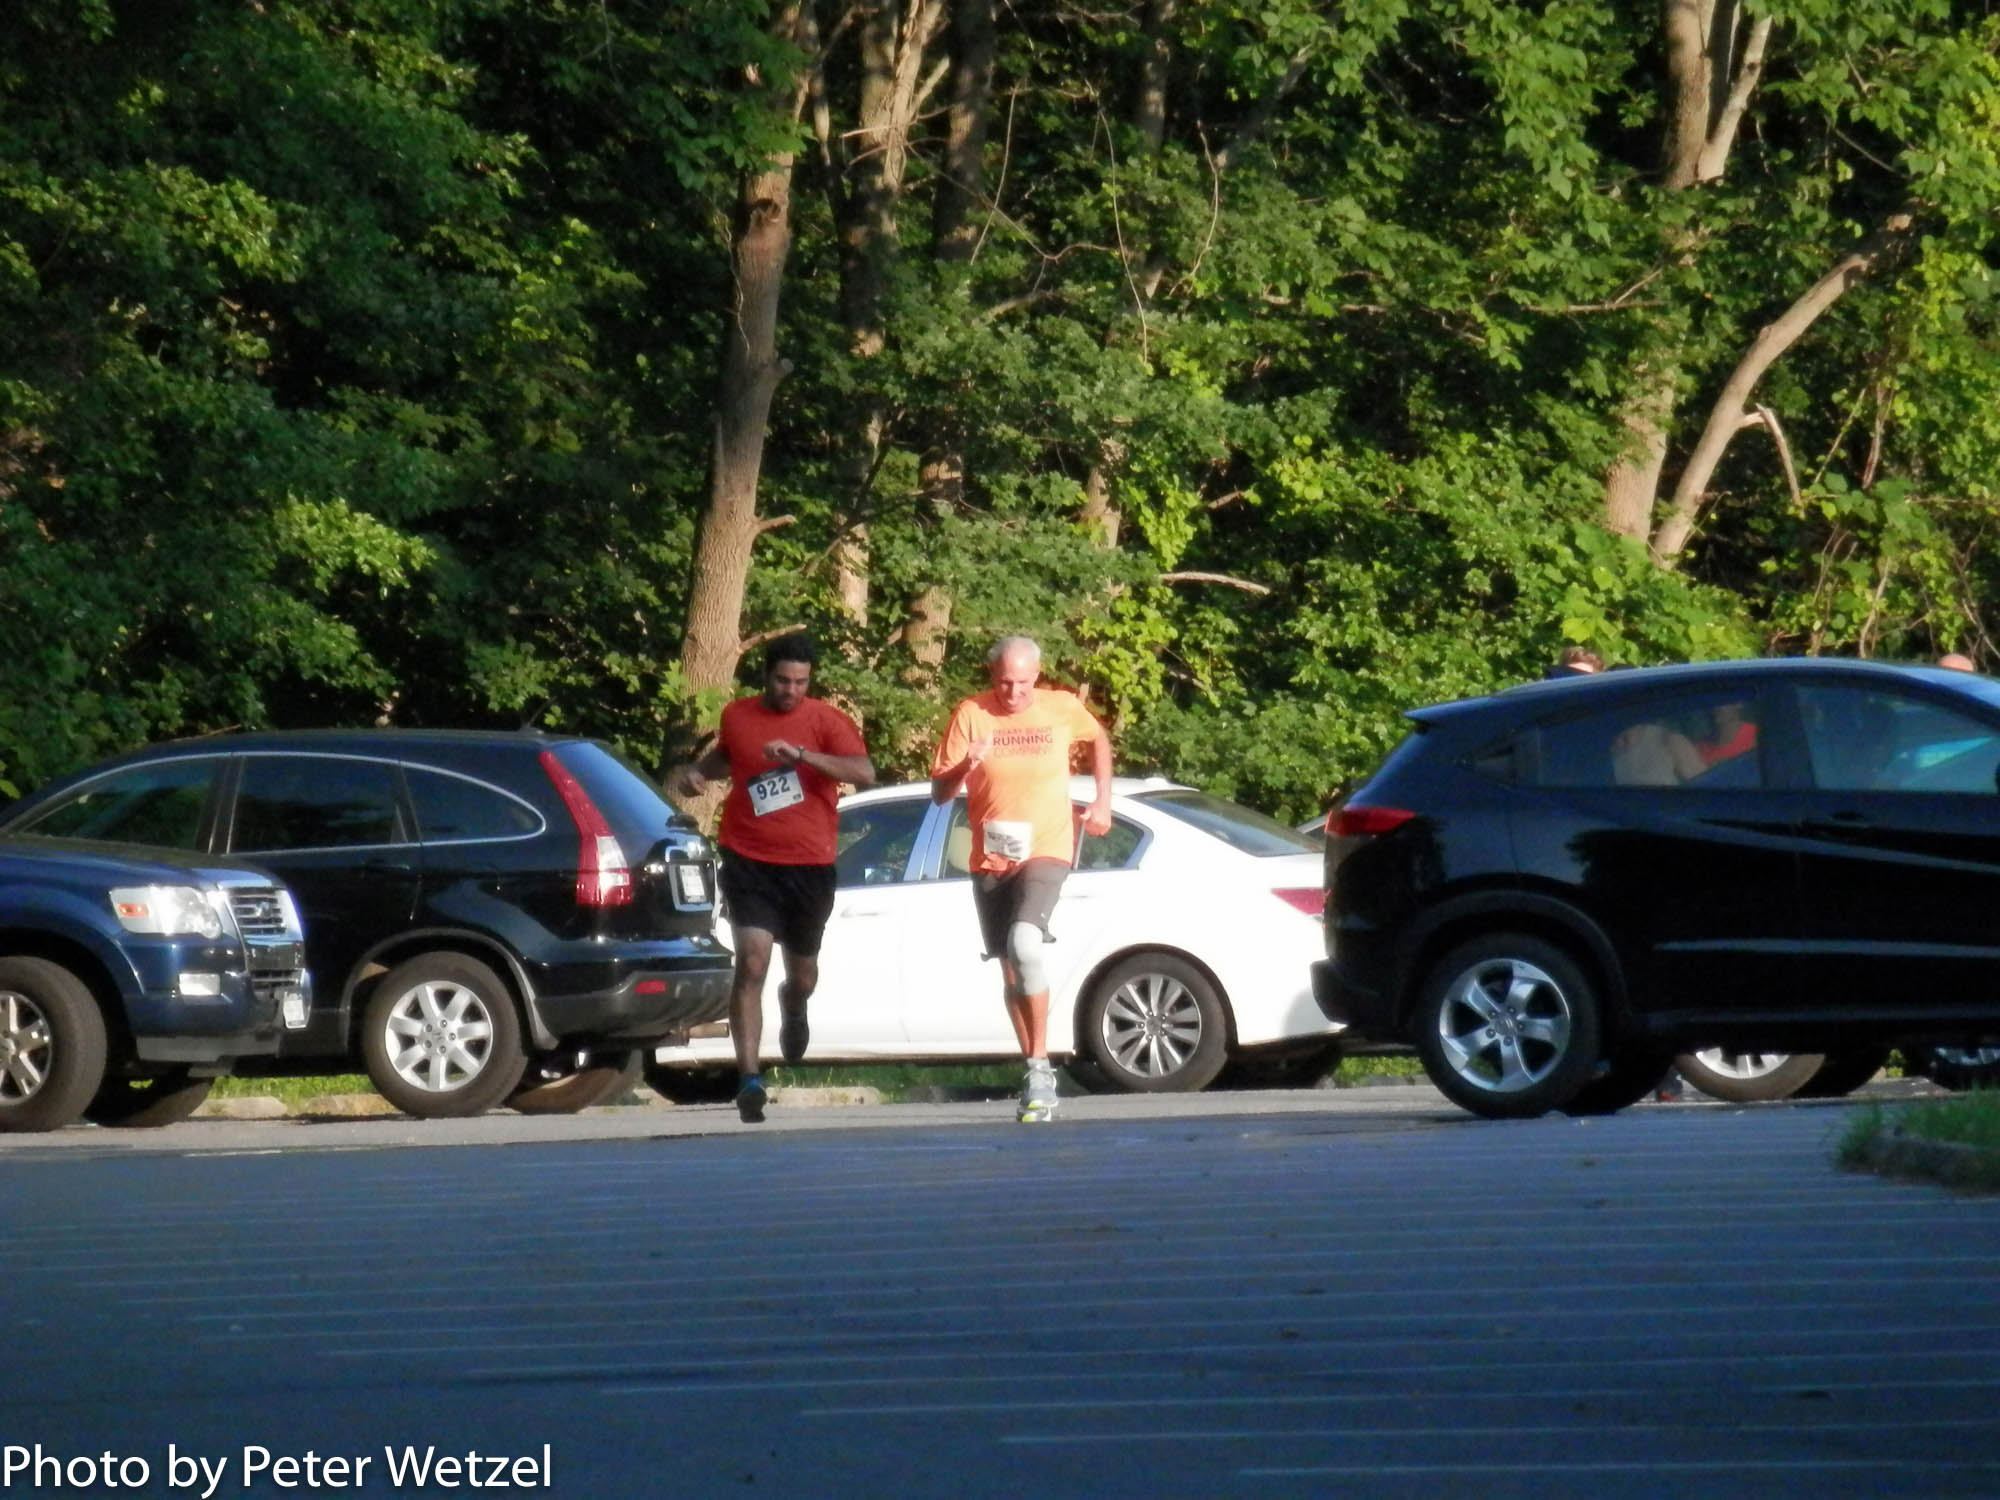 901 - 001 - Putnam County Classic 2016 Taconic Road Runners - Peter Wetzel - P7130022